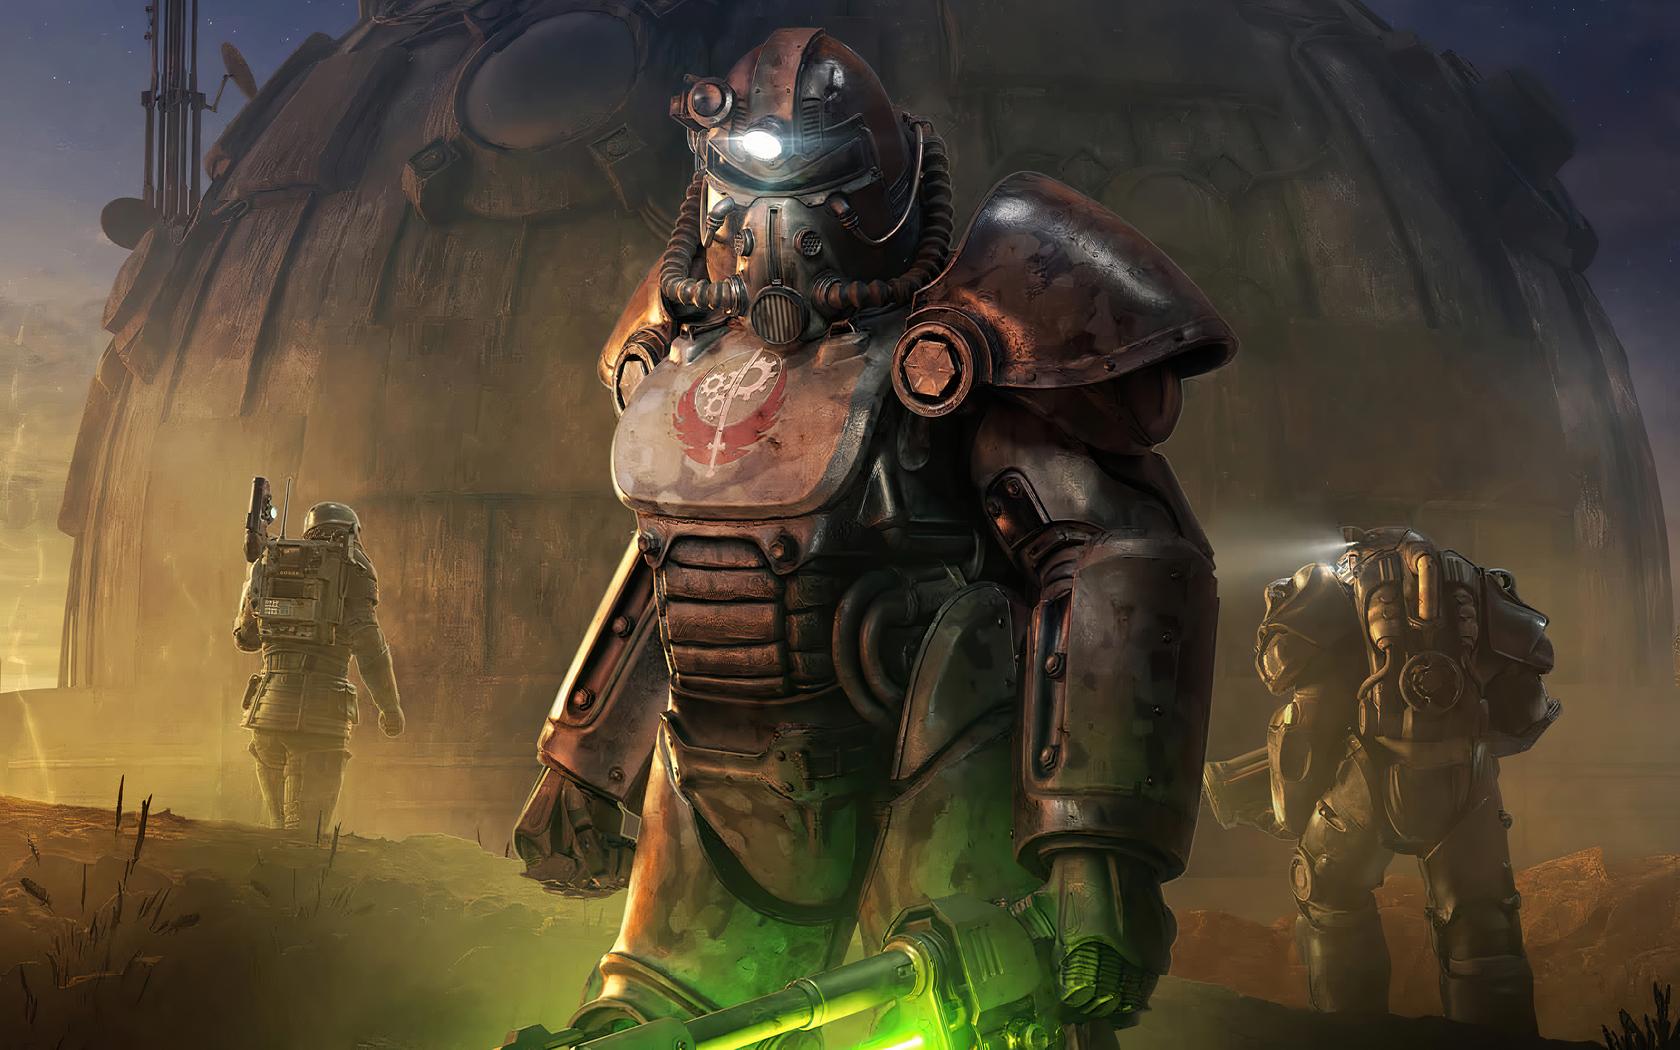 2021-fallout-76-steel-dawn-4k-xh.jpg